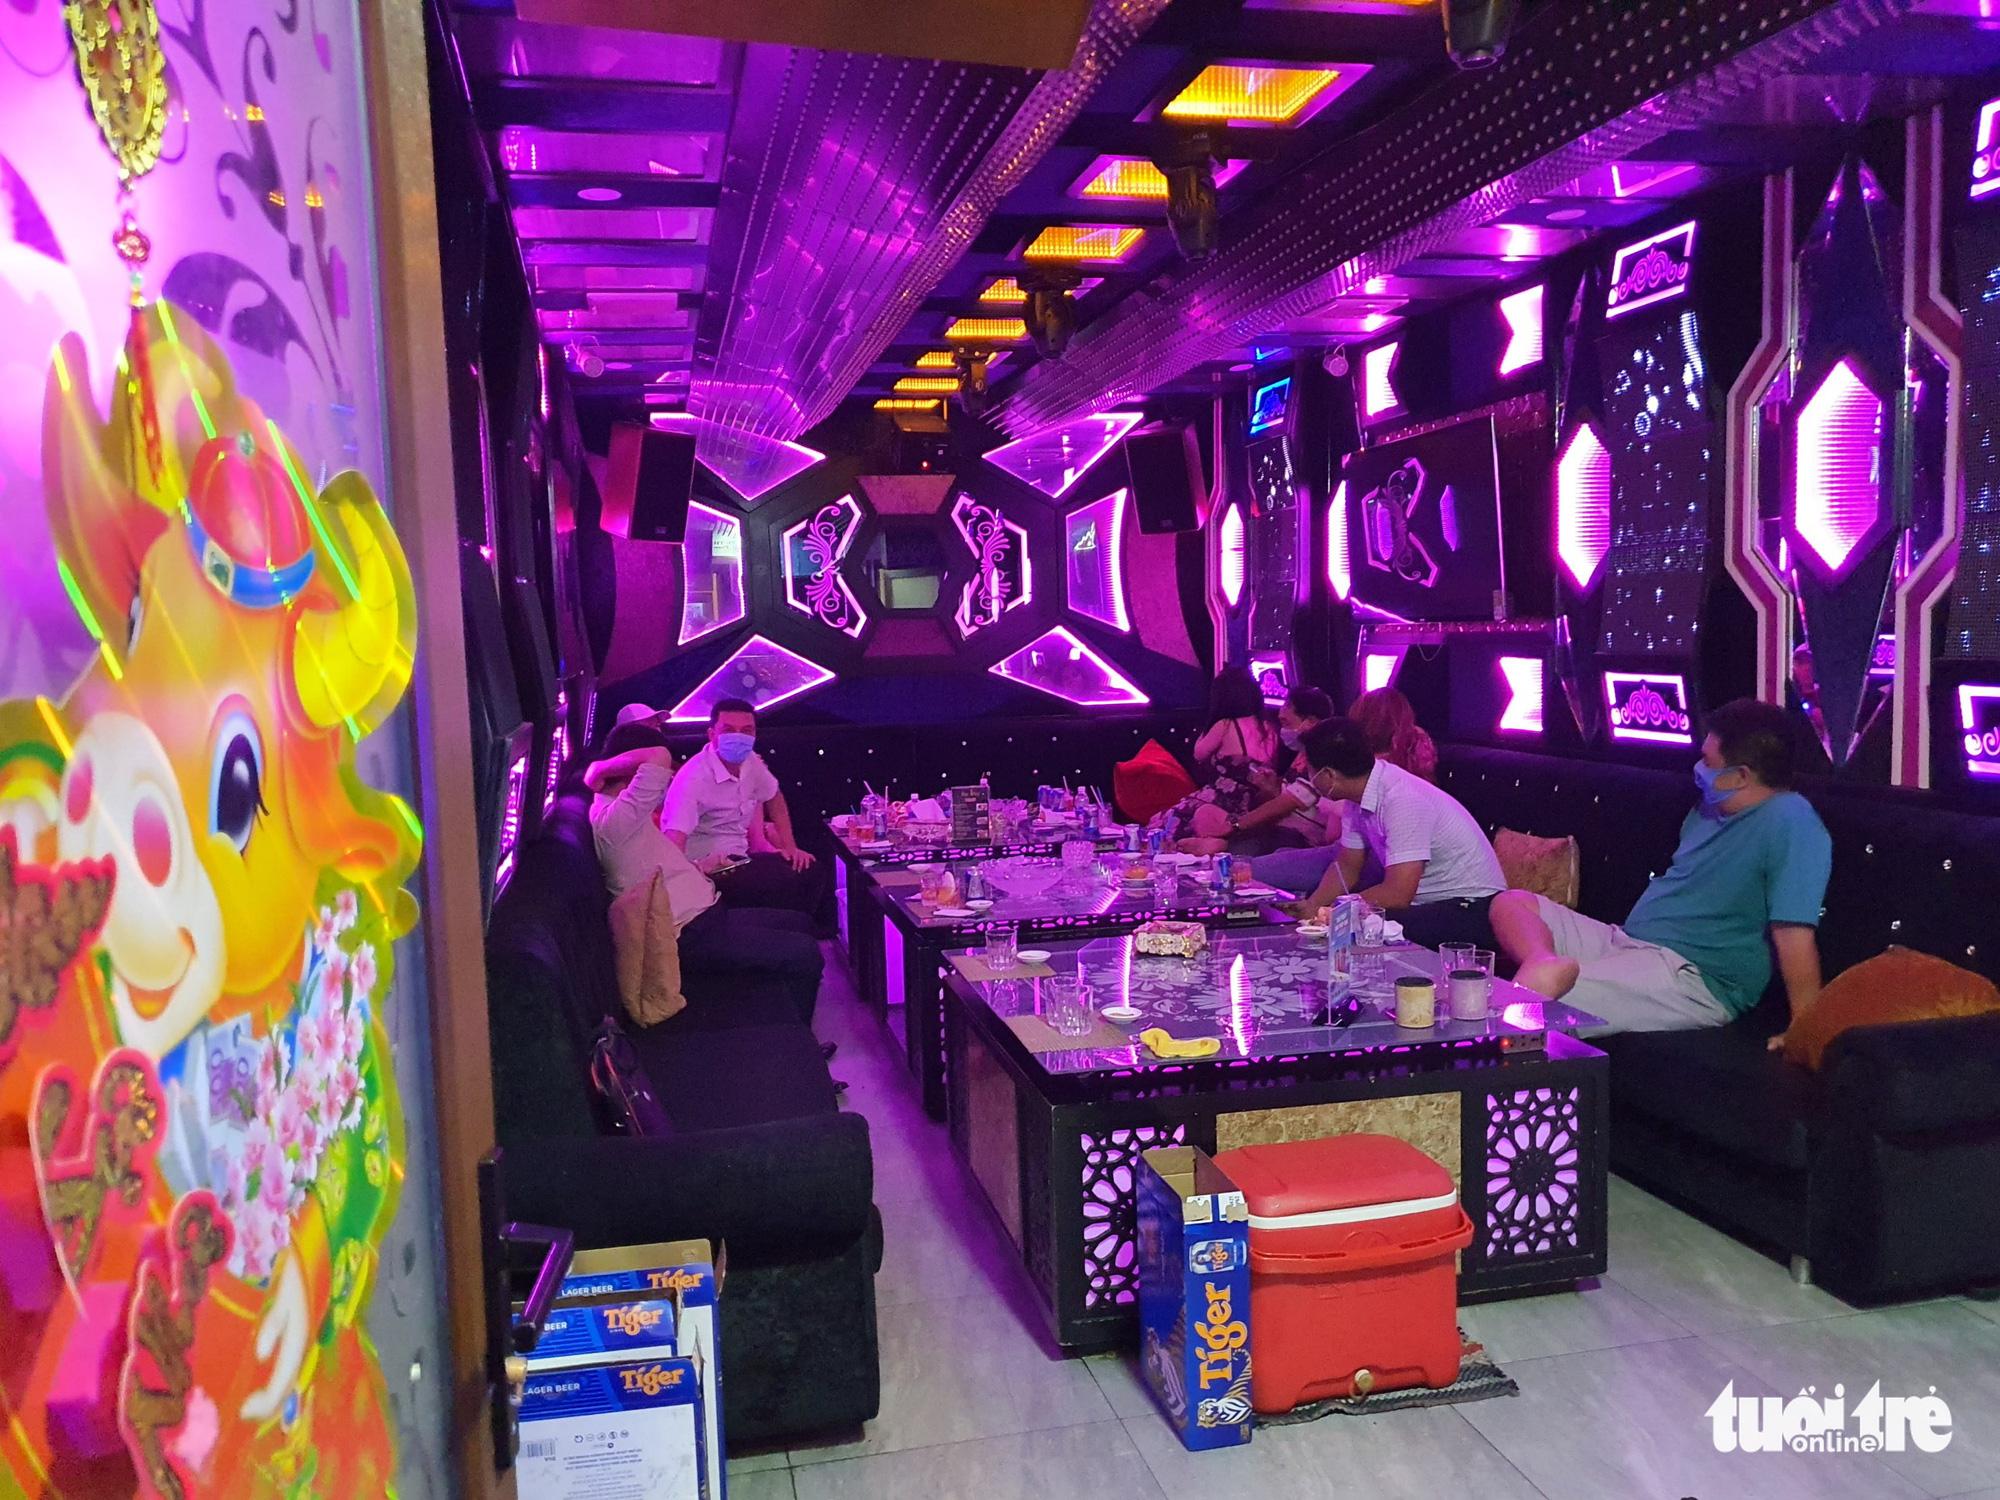 Ho Chi Minh City restaurant fined for offering karaoke service notwithstanding coronavirus ban